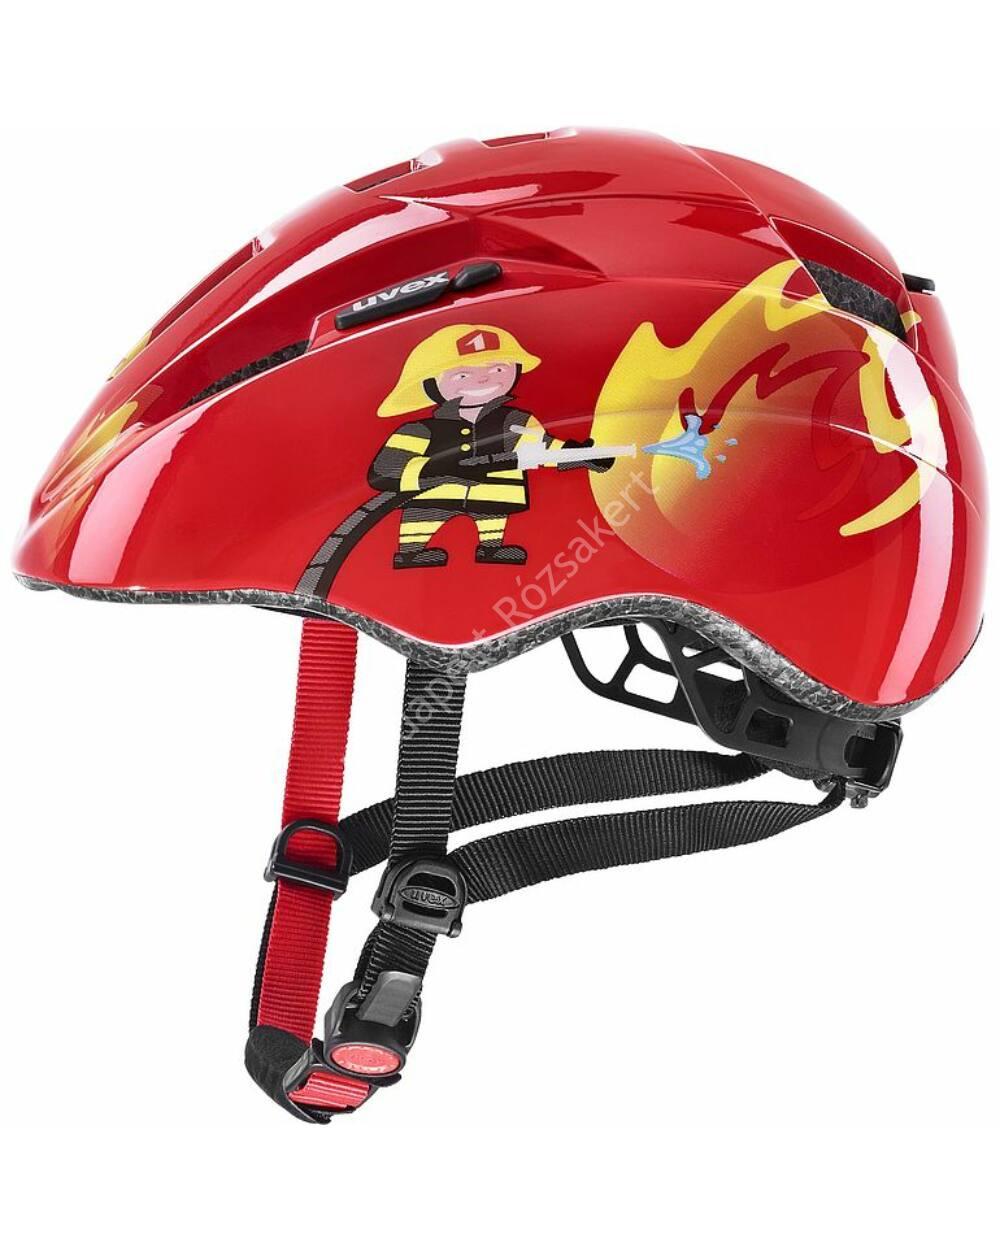 Uvex Kid 2 red fireman bukósisak, 46-52cm